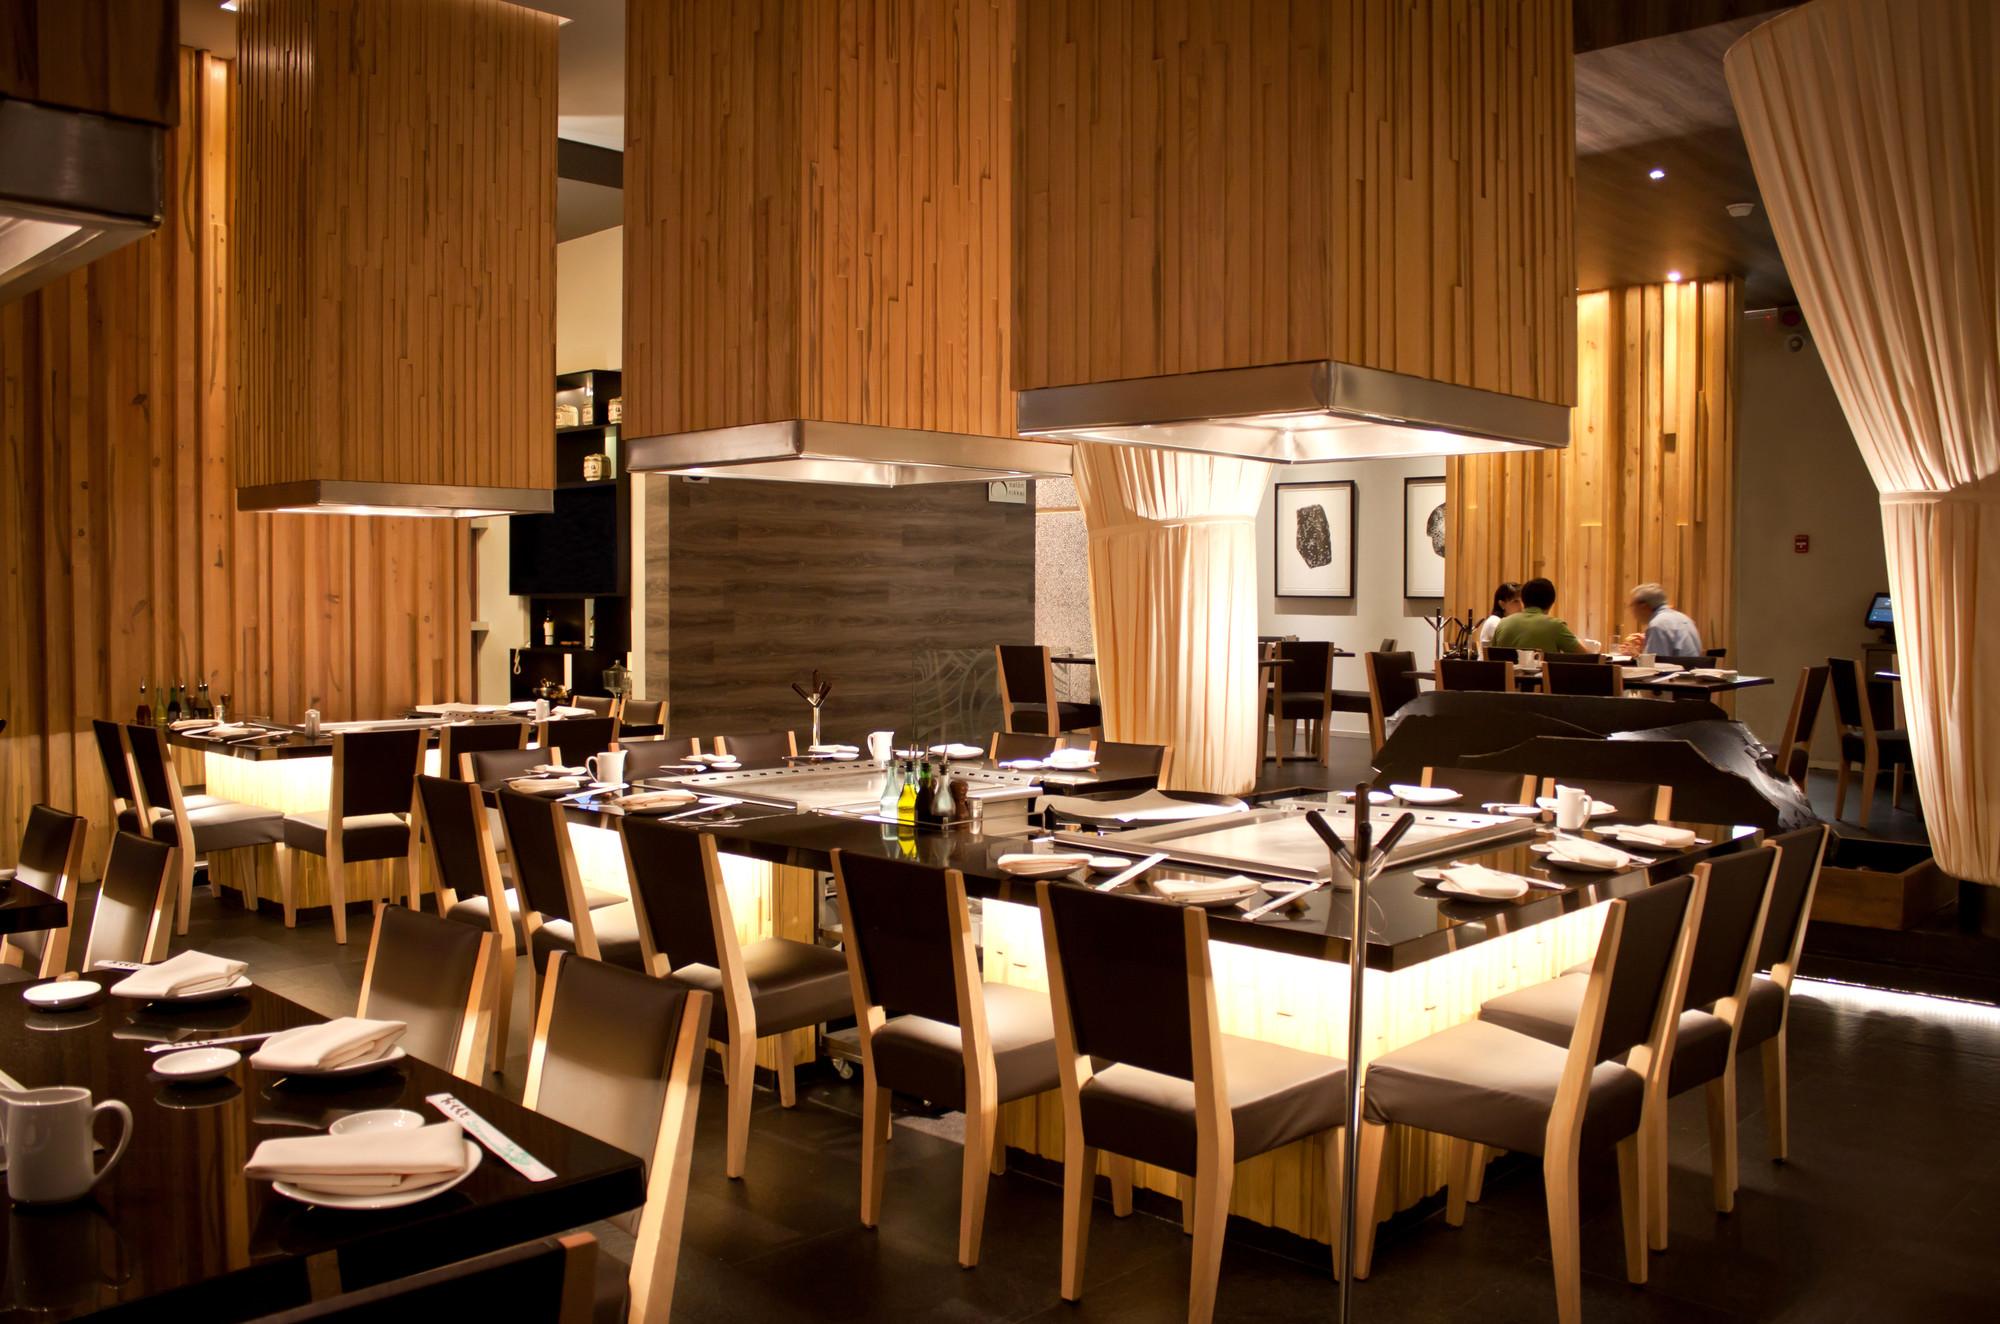 Image result for Stylish Restaurant Furniture